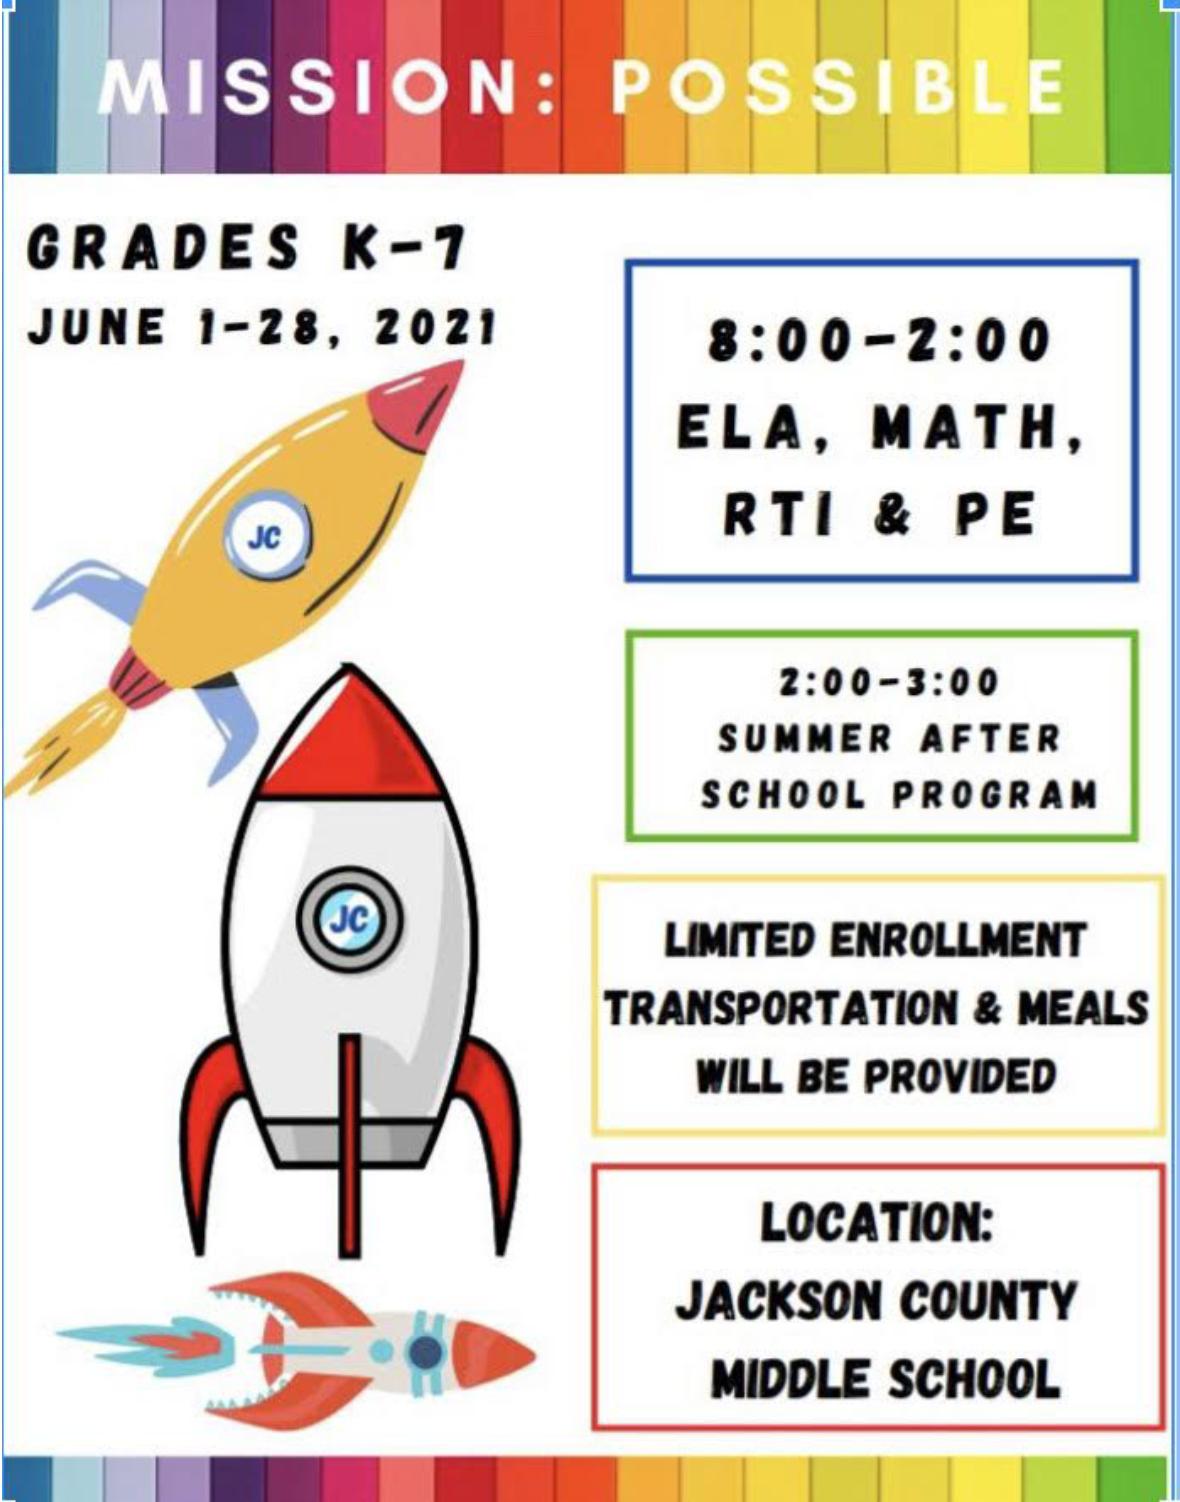 Image of 2021 Summer Learning Camp Grades K-7